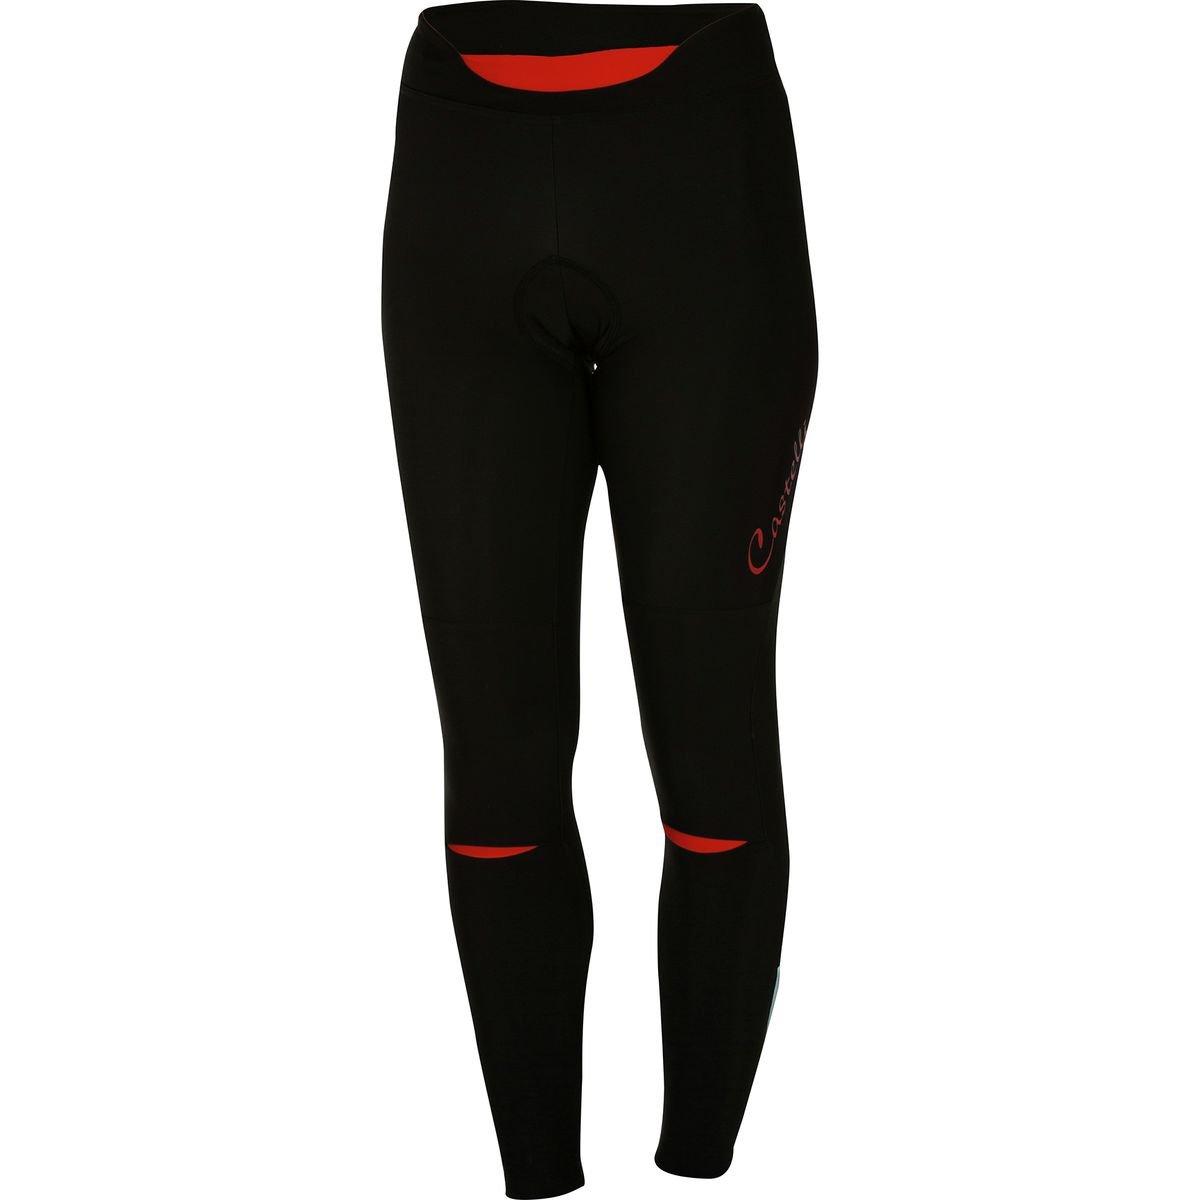 Castelli Chic Tight - Women's Black/Red, S